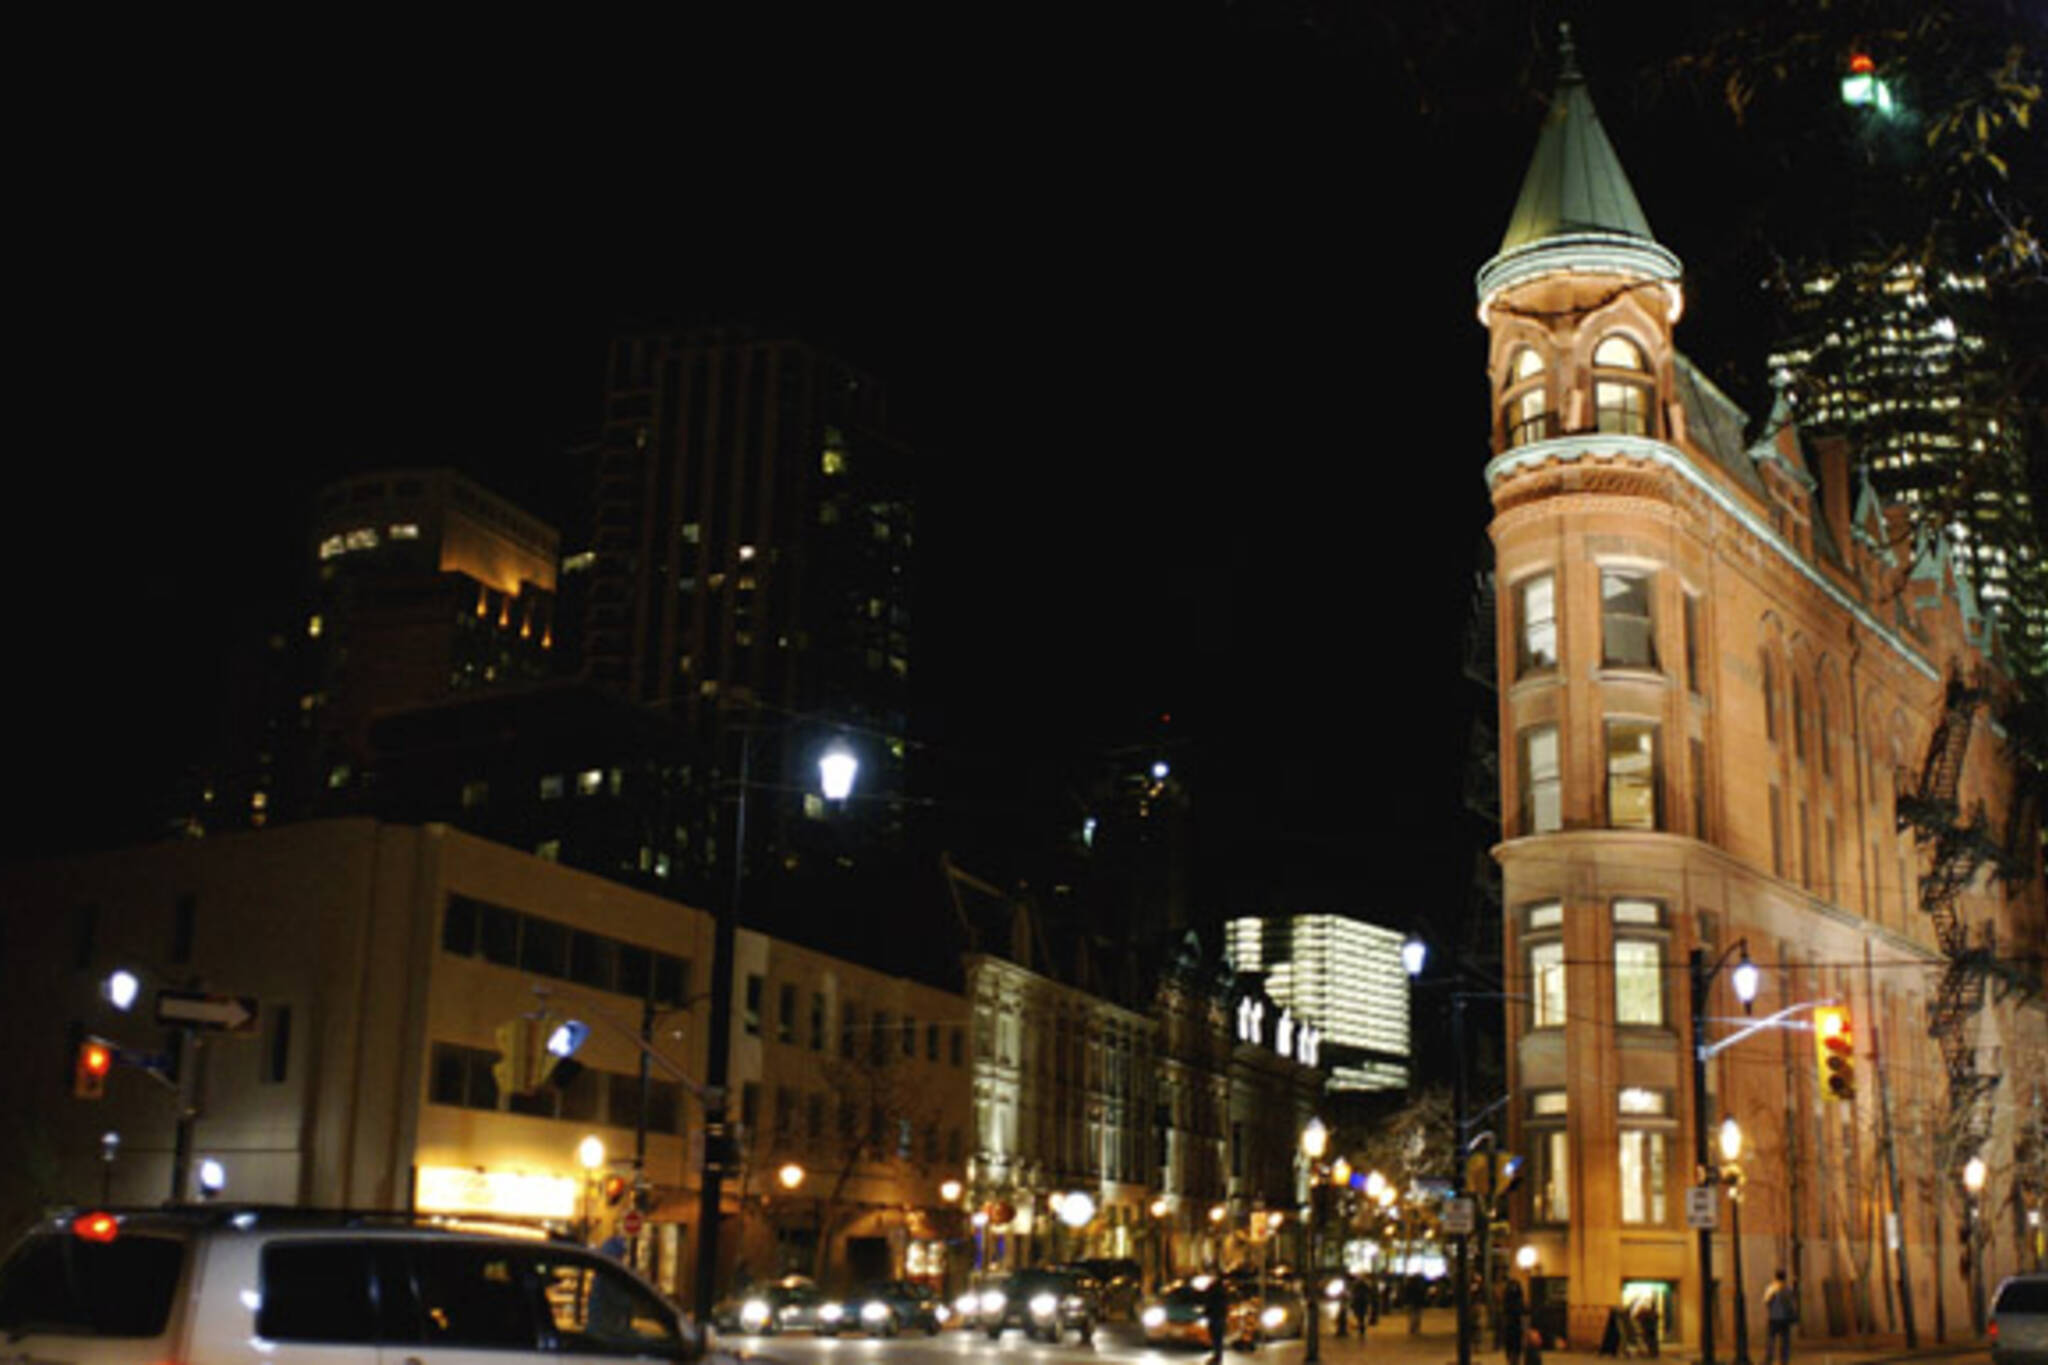 Heritage Lights in St. Lawrence Market neighbourhood